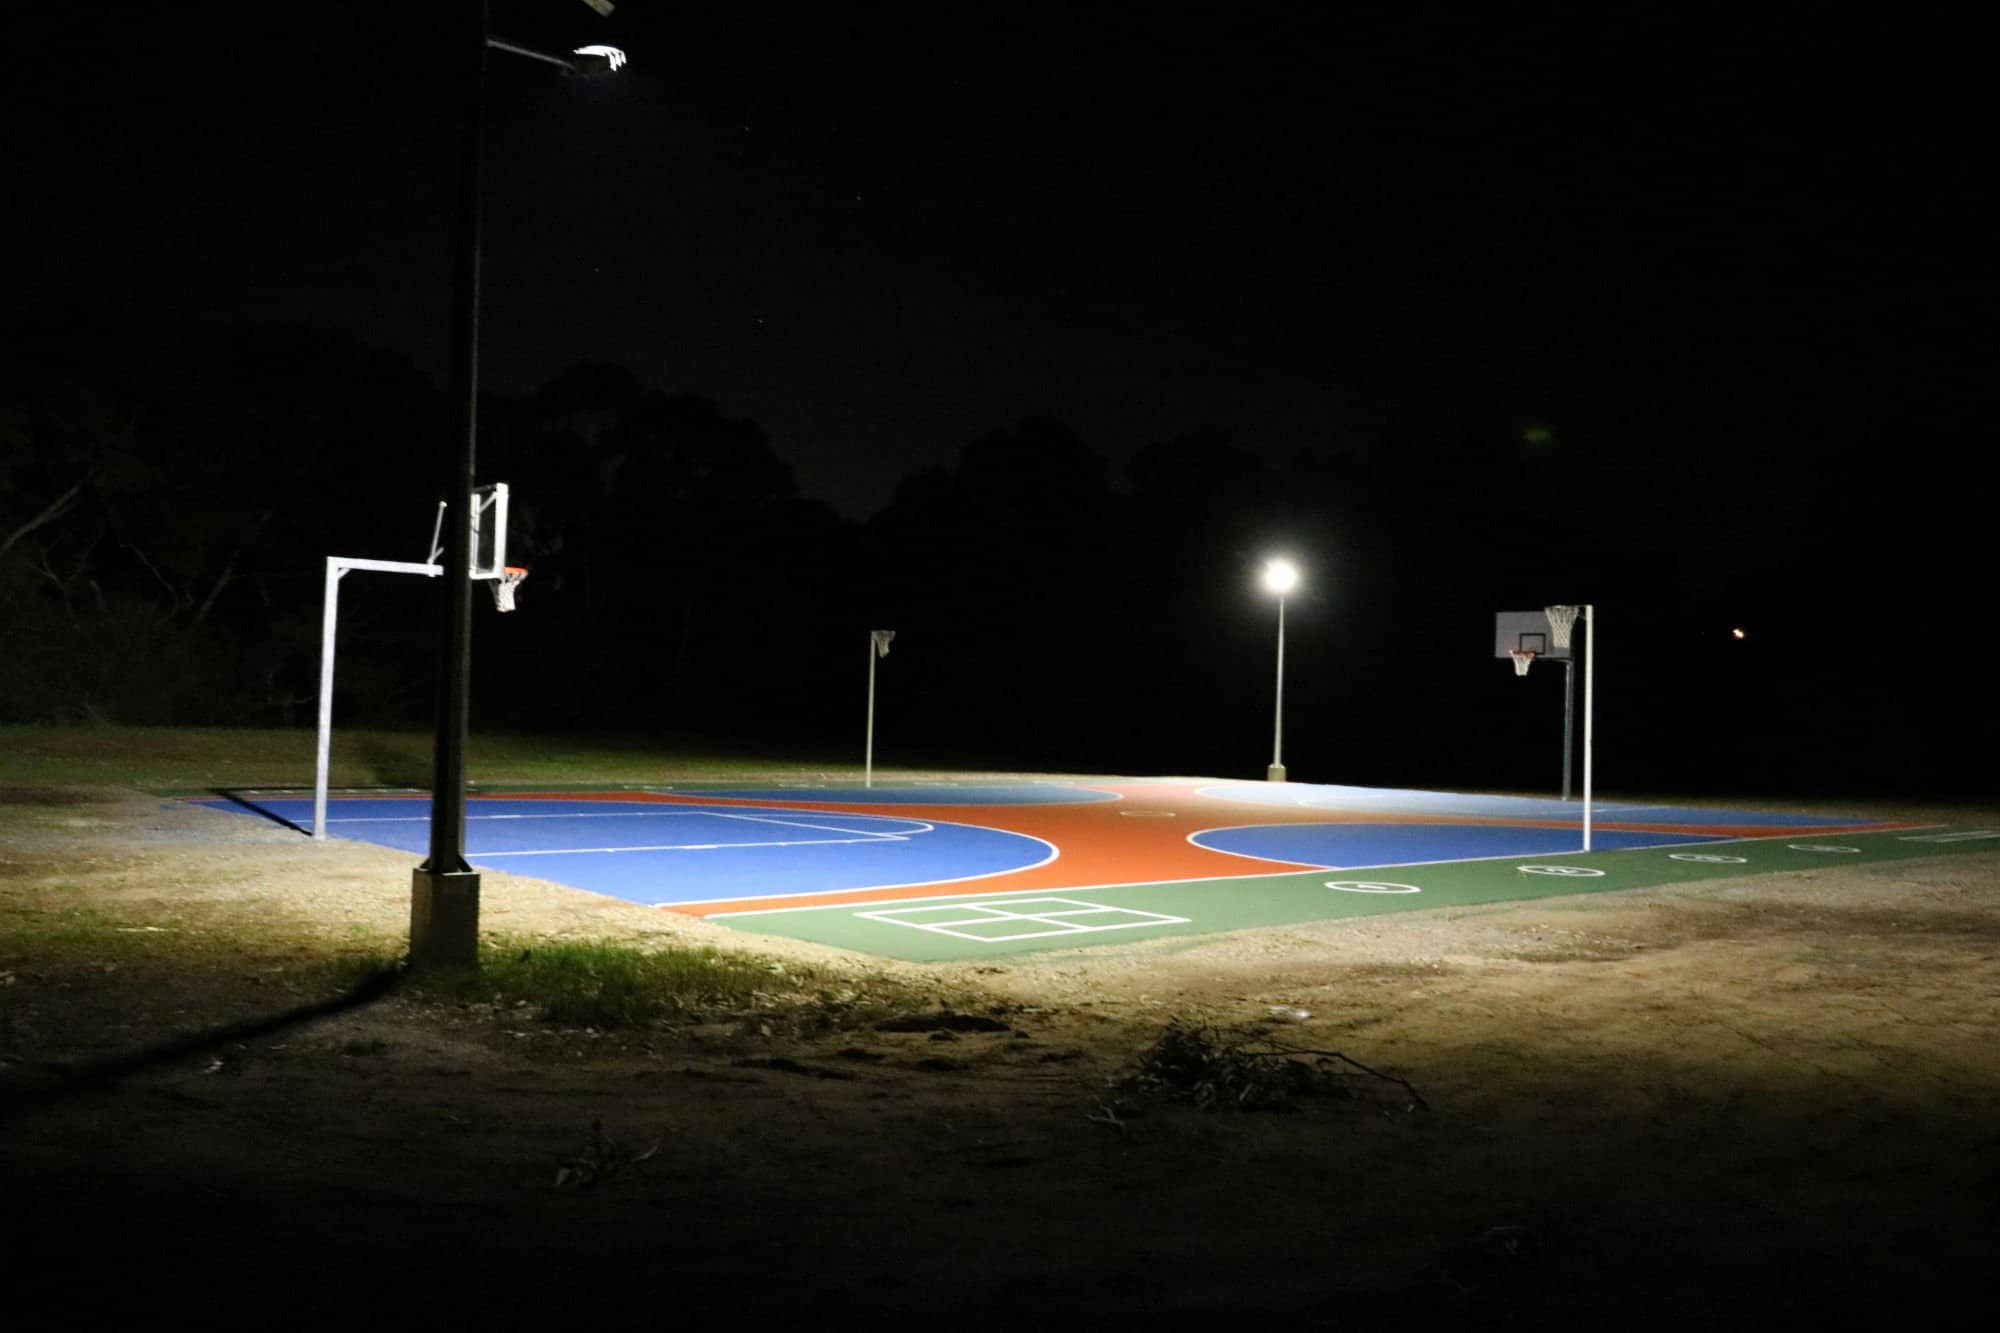 solar powered basketball court lighting - Hewett SA